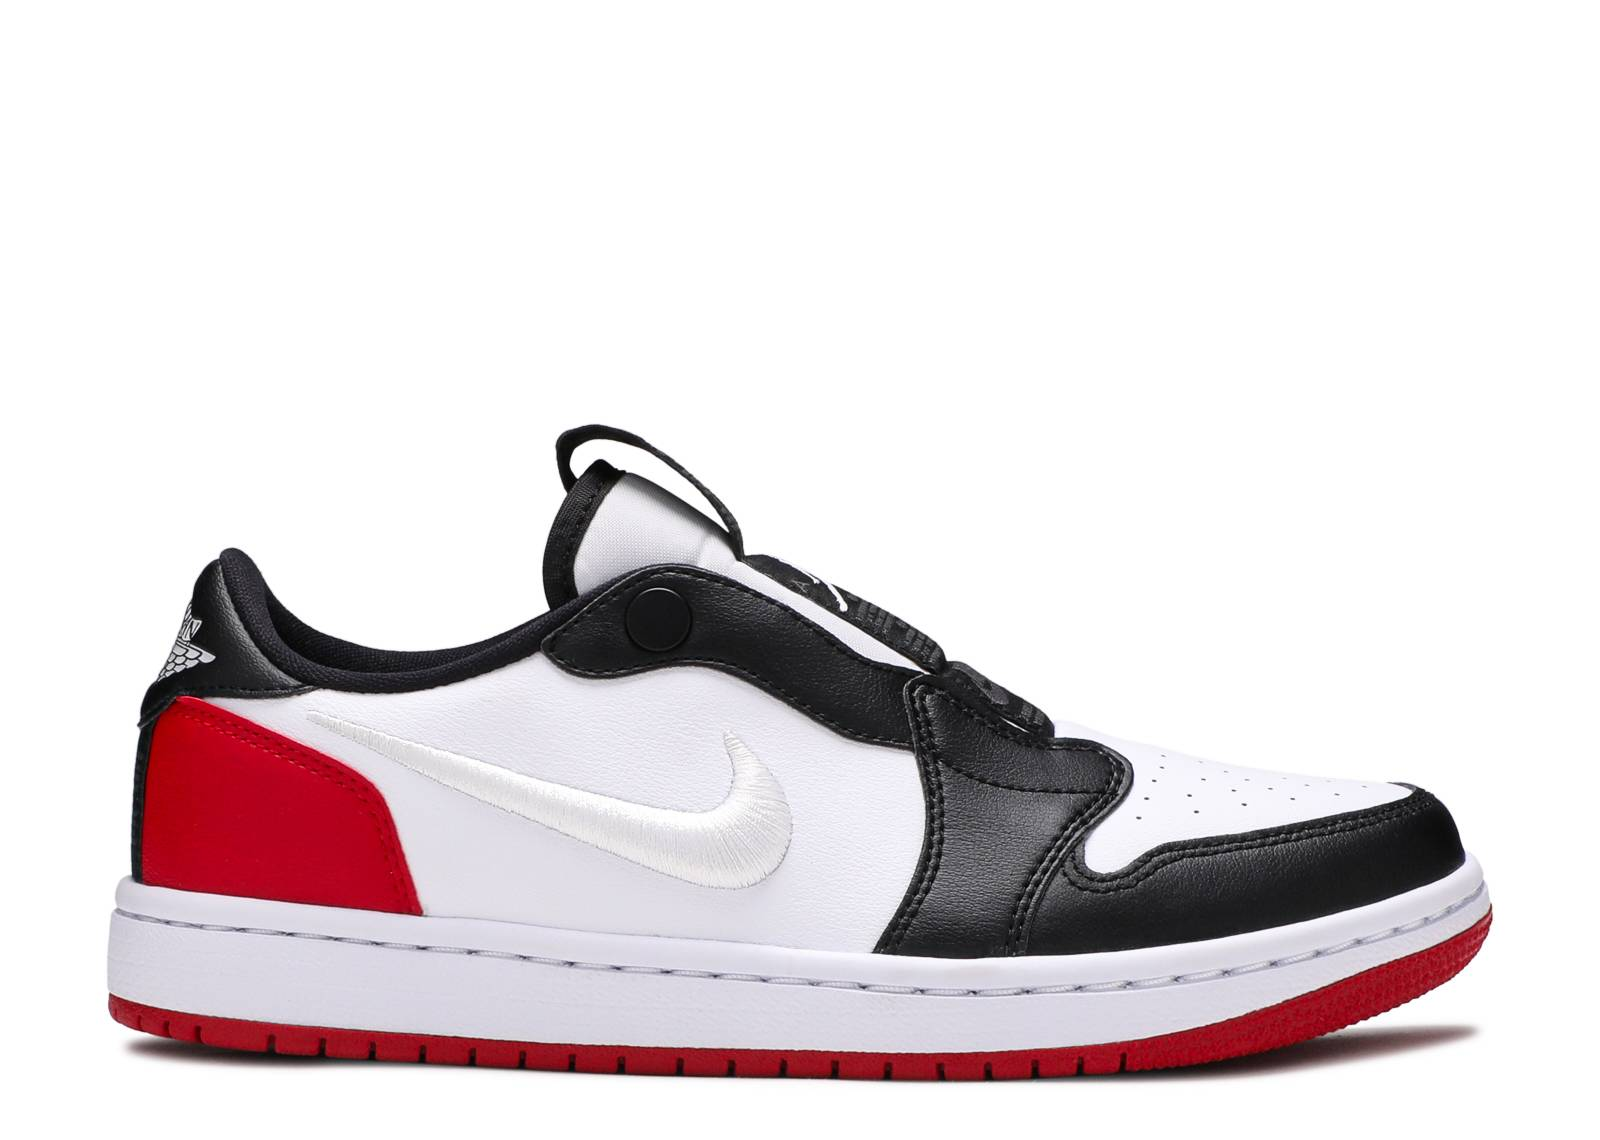 "Wmns Air Jordan 1 Low Slip 'Black Toe' ""Black Toe"""